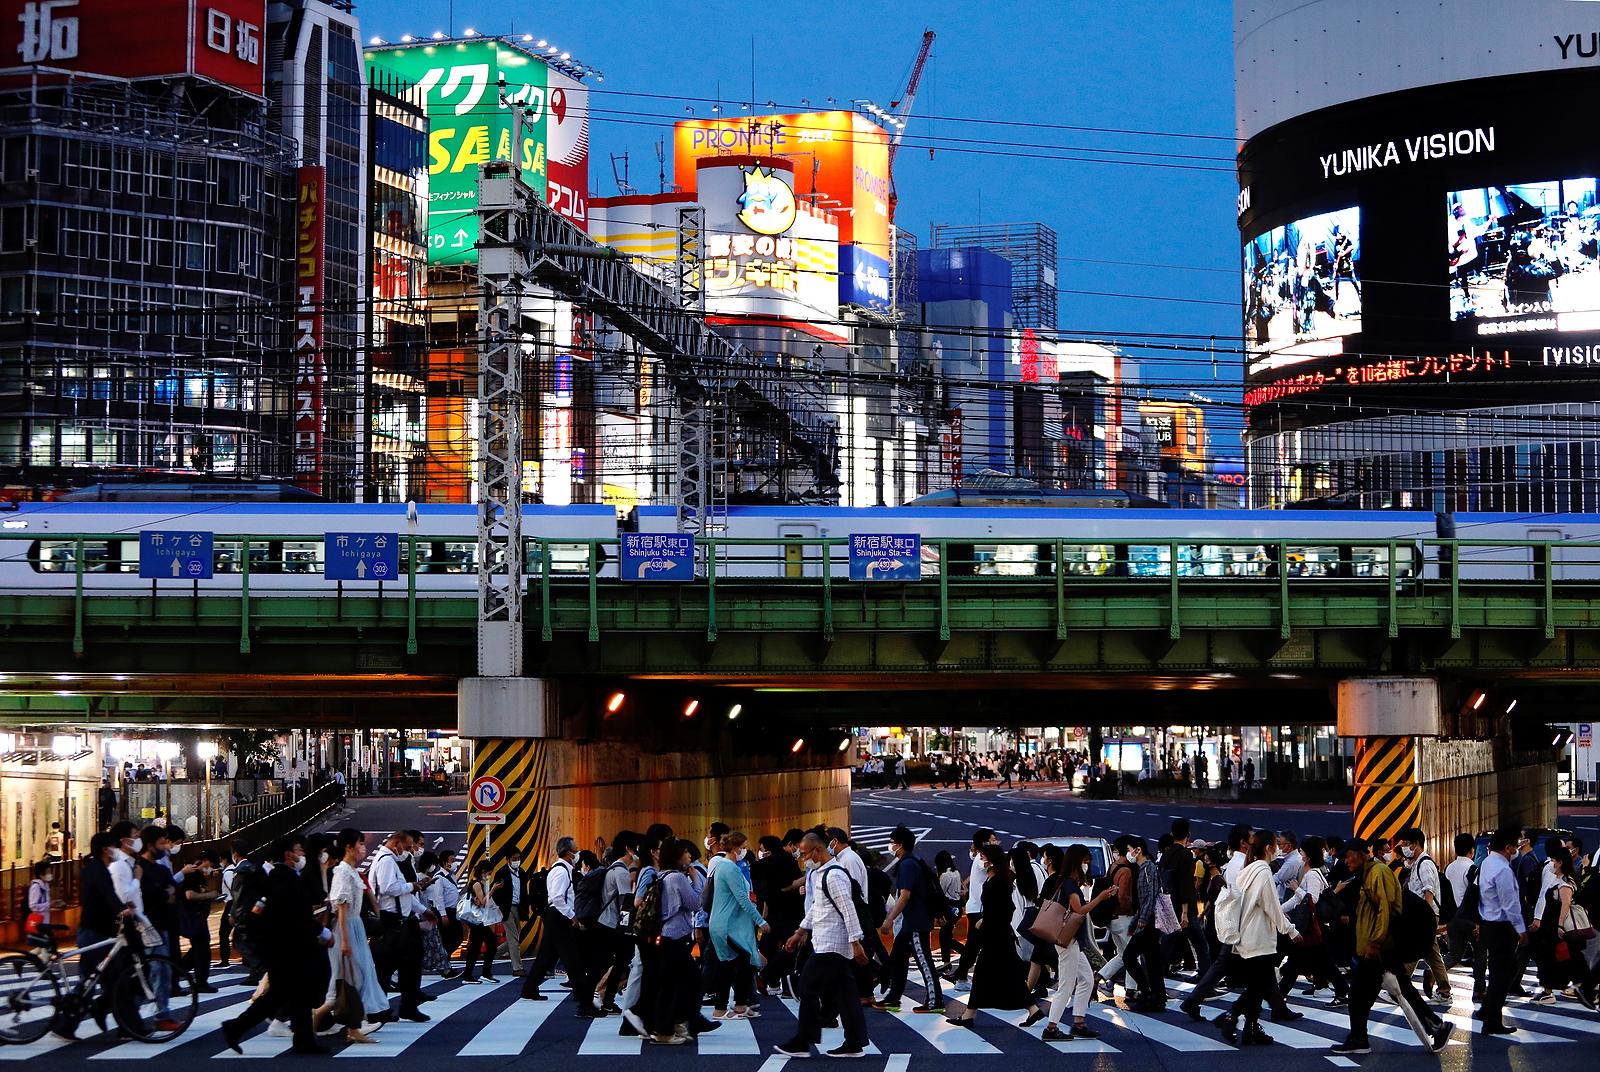 People cross a road in Shinjuku, Tokyo, Japan, June 3, 2021. REUTERS